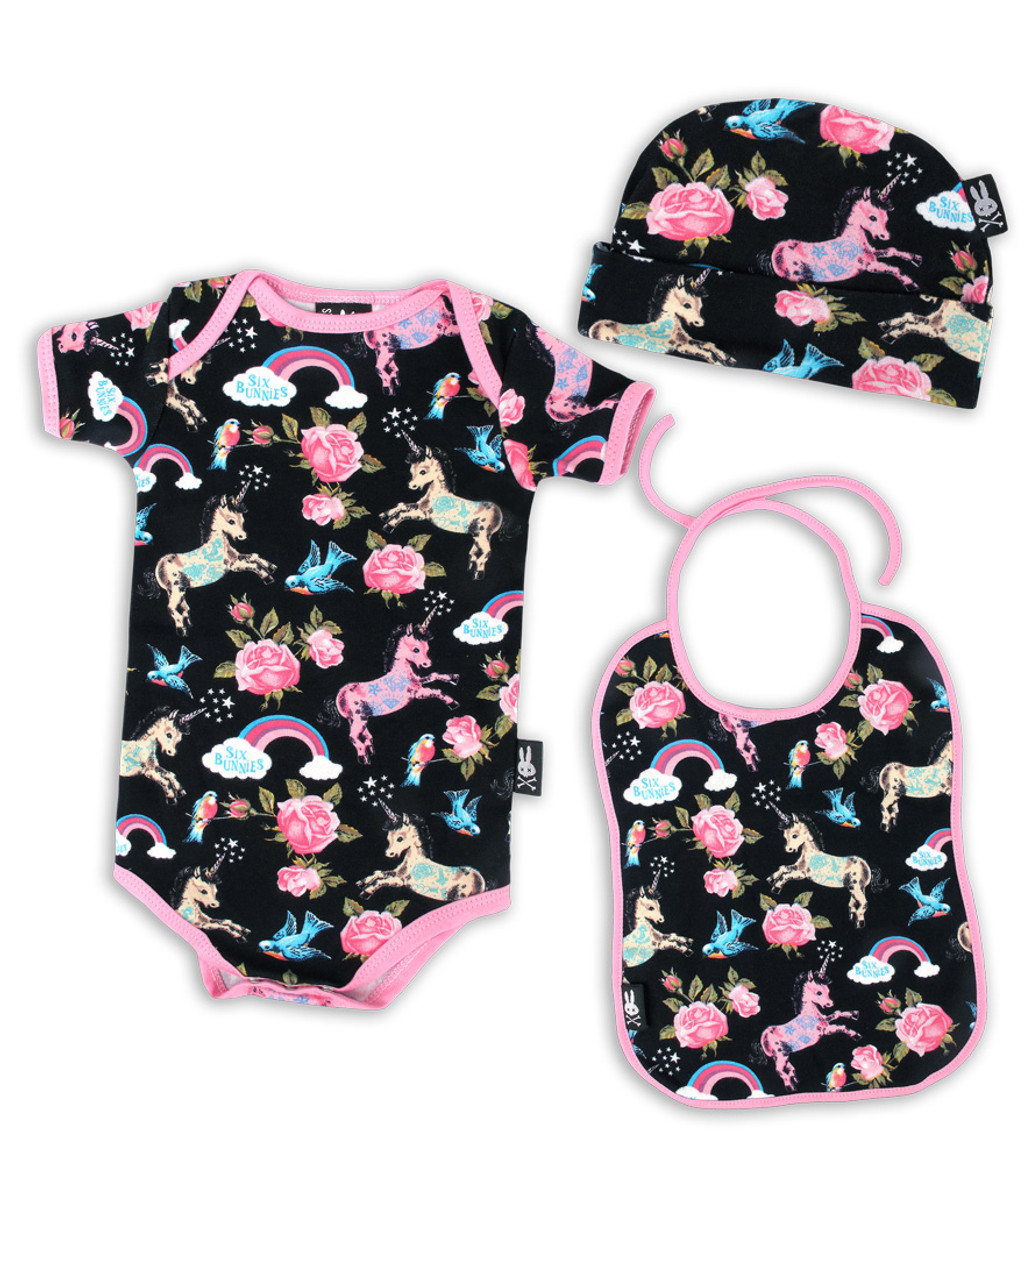 5c491a23ecc Six Bunnies Unicorn Wonderland onesie